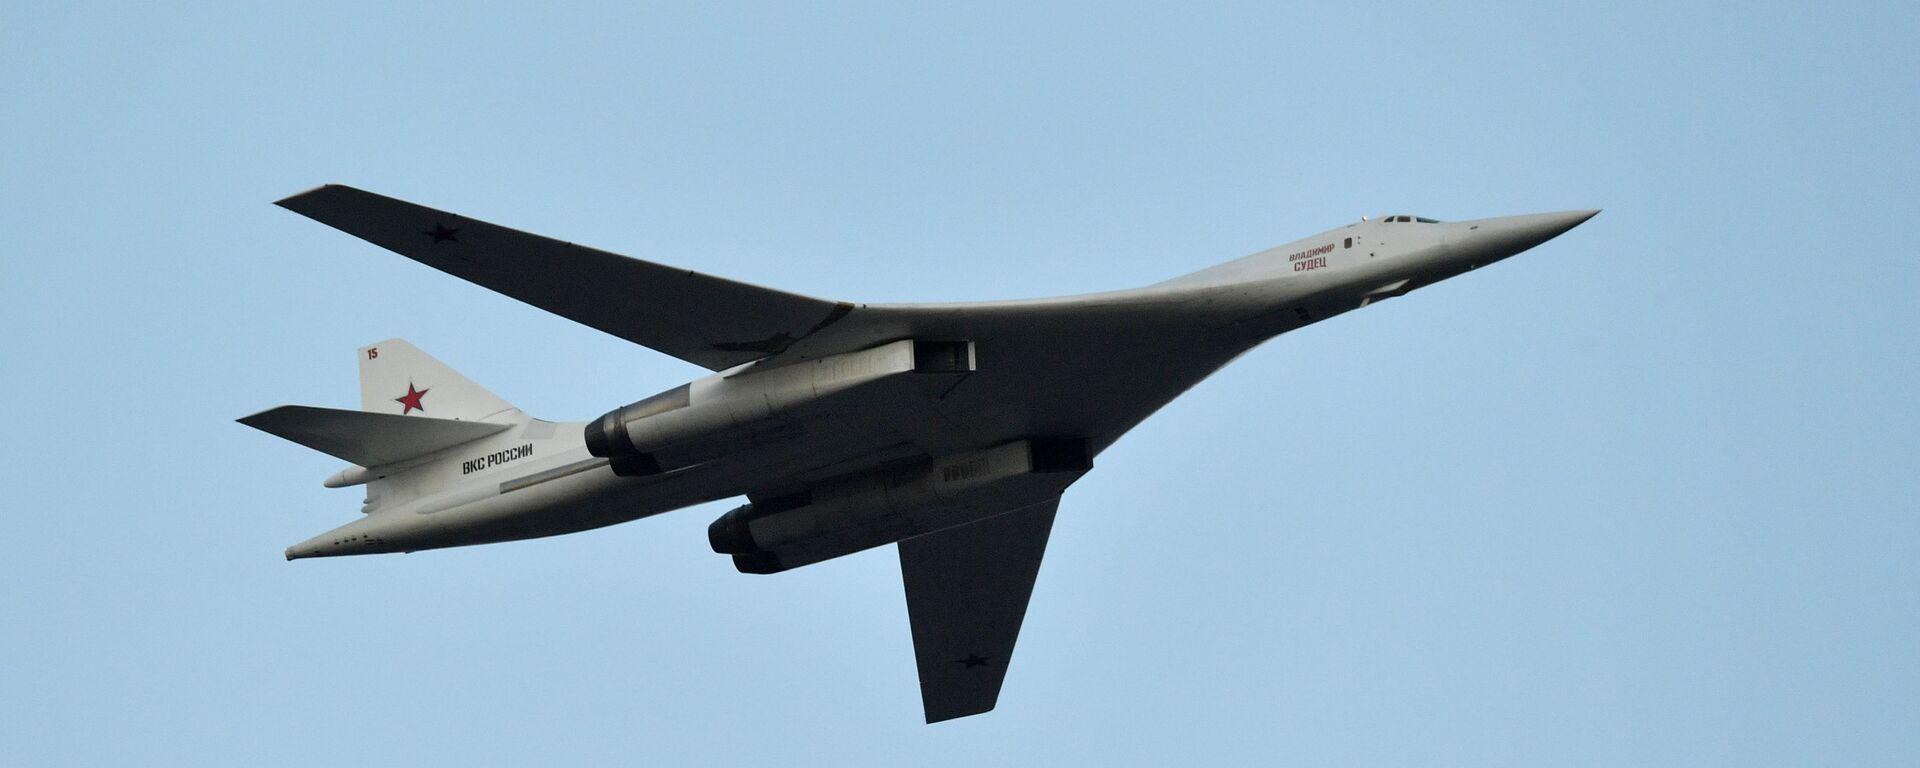 Máy bay ném bom Tu-160 - Sputnik Việt Nam, 1920, 28.07.2021